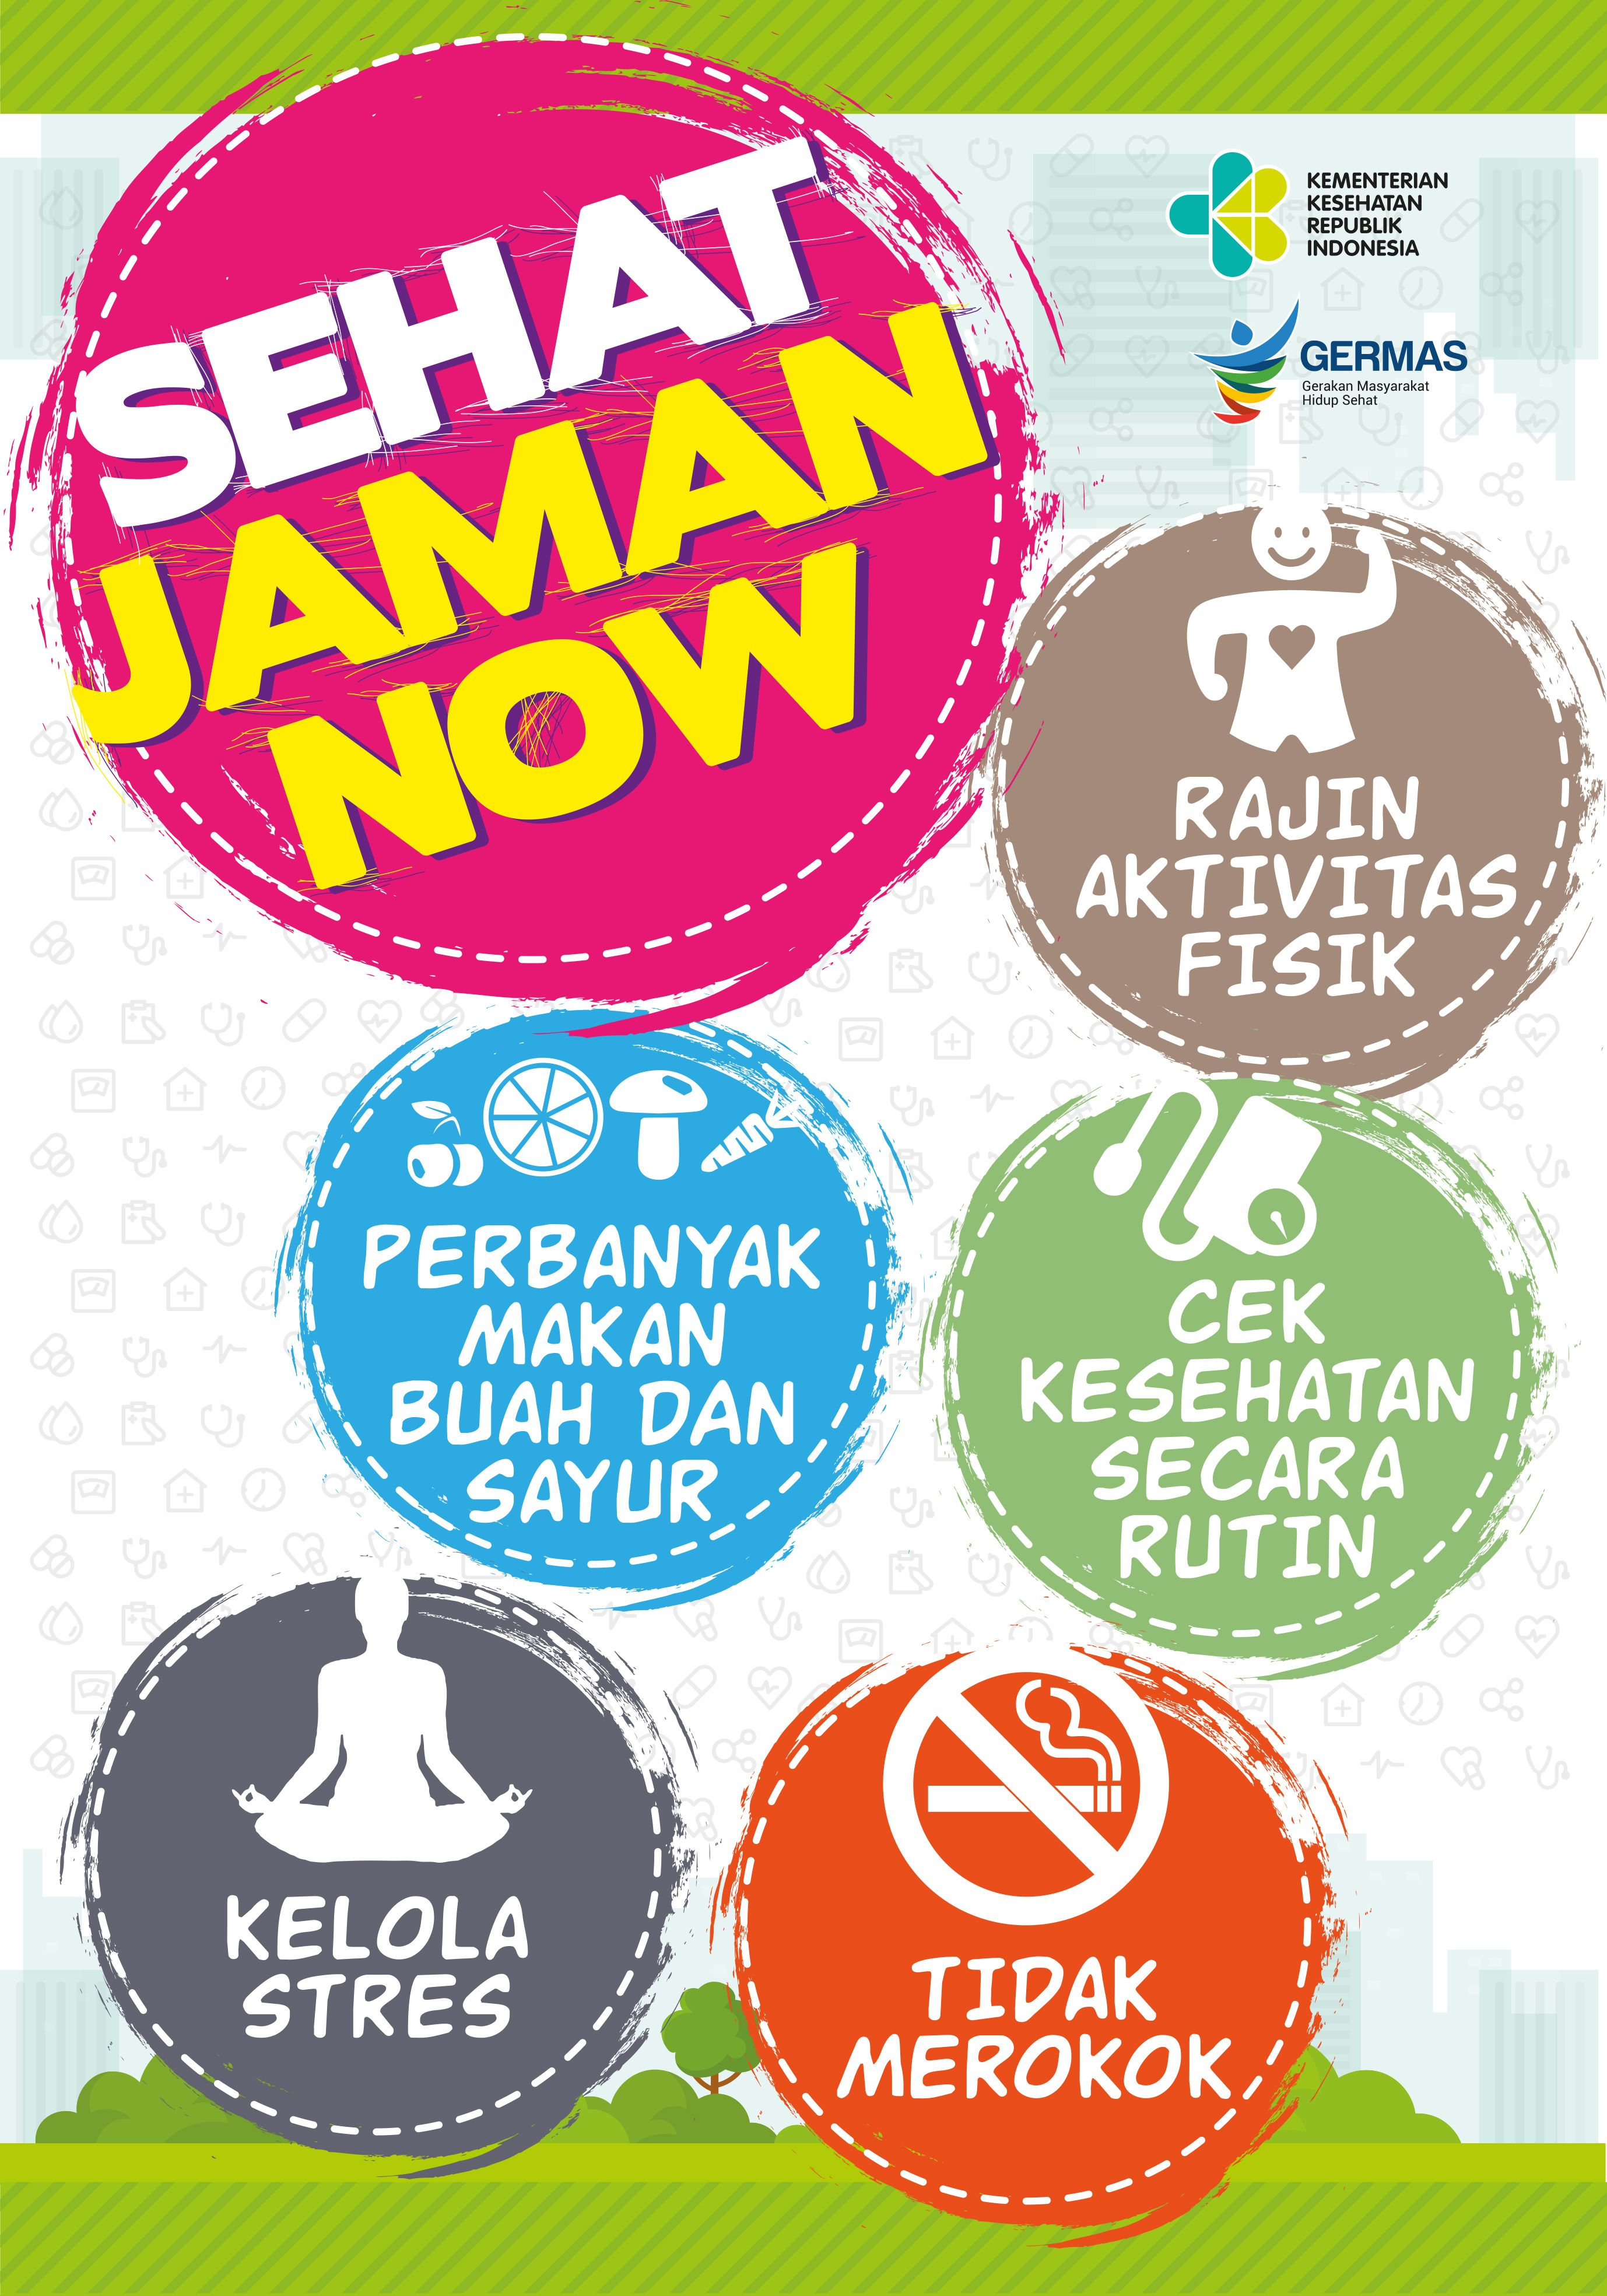 Contoh Poster Kesehatan : contoh, poster, kesehatan, Melanda, Sukmawaty, Kesehatan, Hidup, Sehat,, Poster,